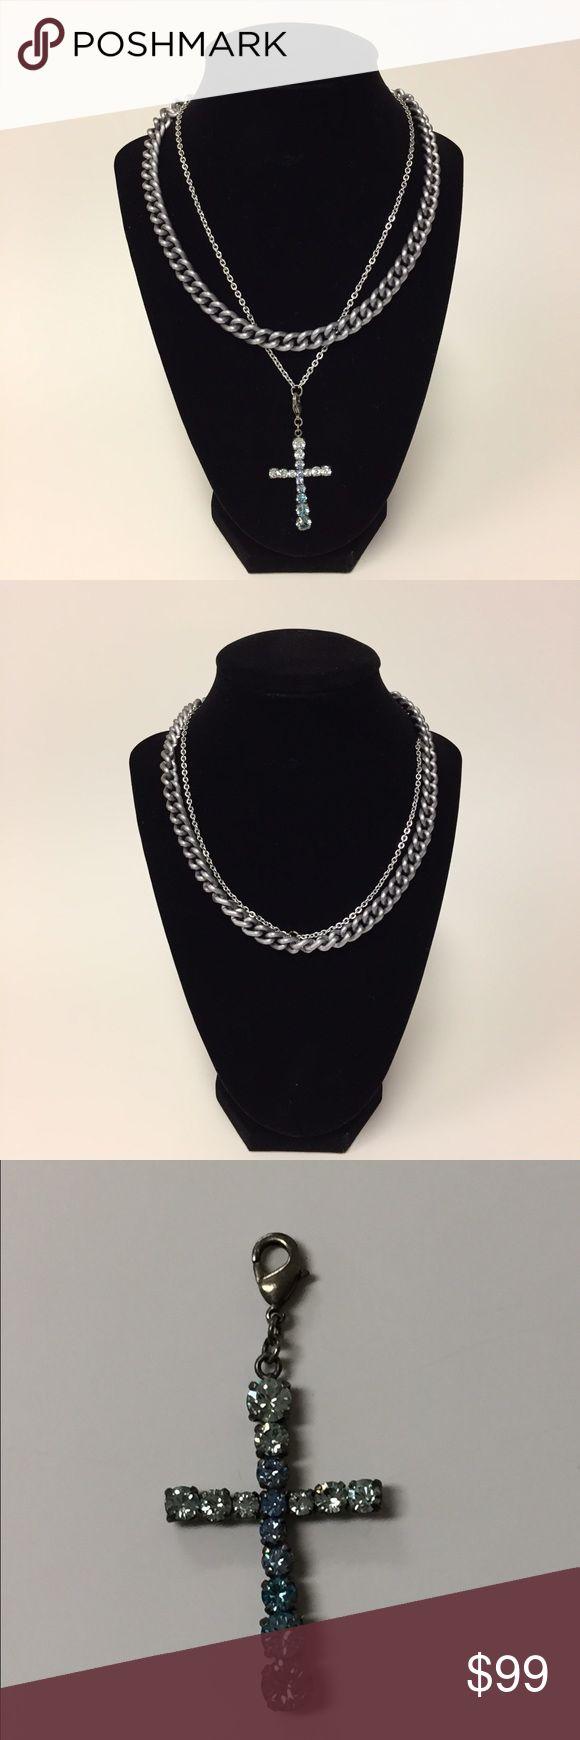 Sabika look necklace - Sabika Necklace Set